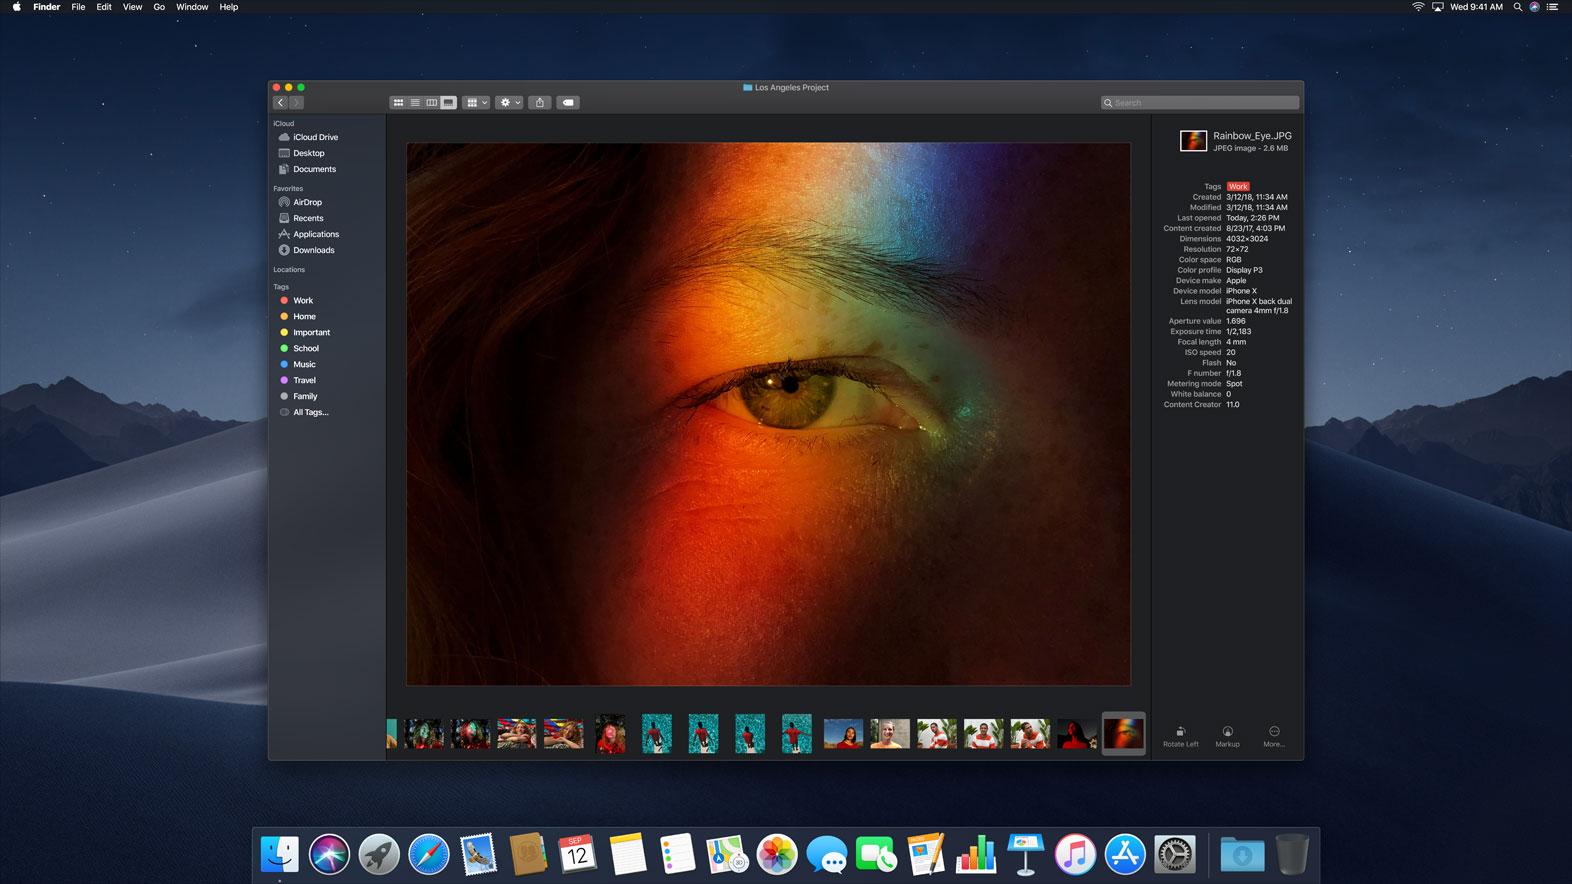 https://www.apple.com/nl/macos/mojave/overview/darkmode/gallery/finder/image_large_2x.jpg